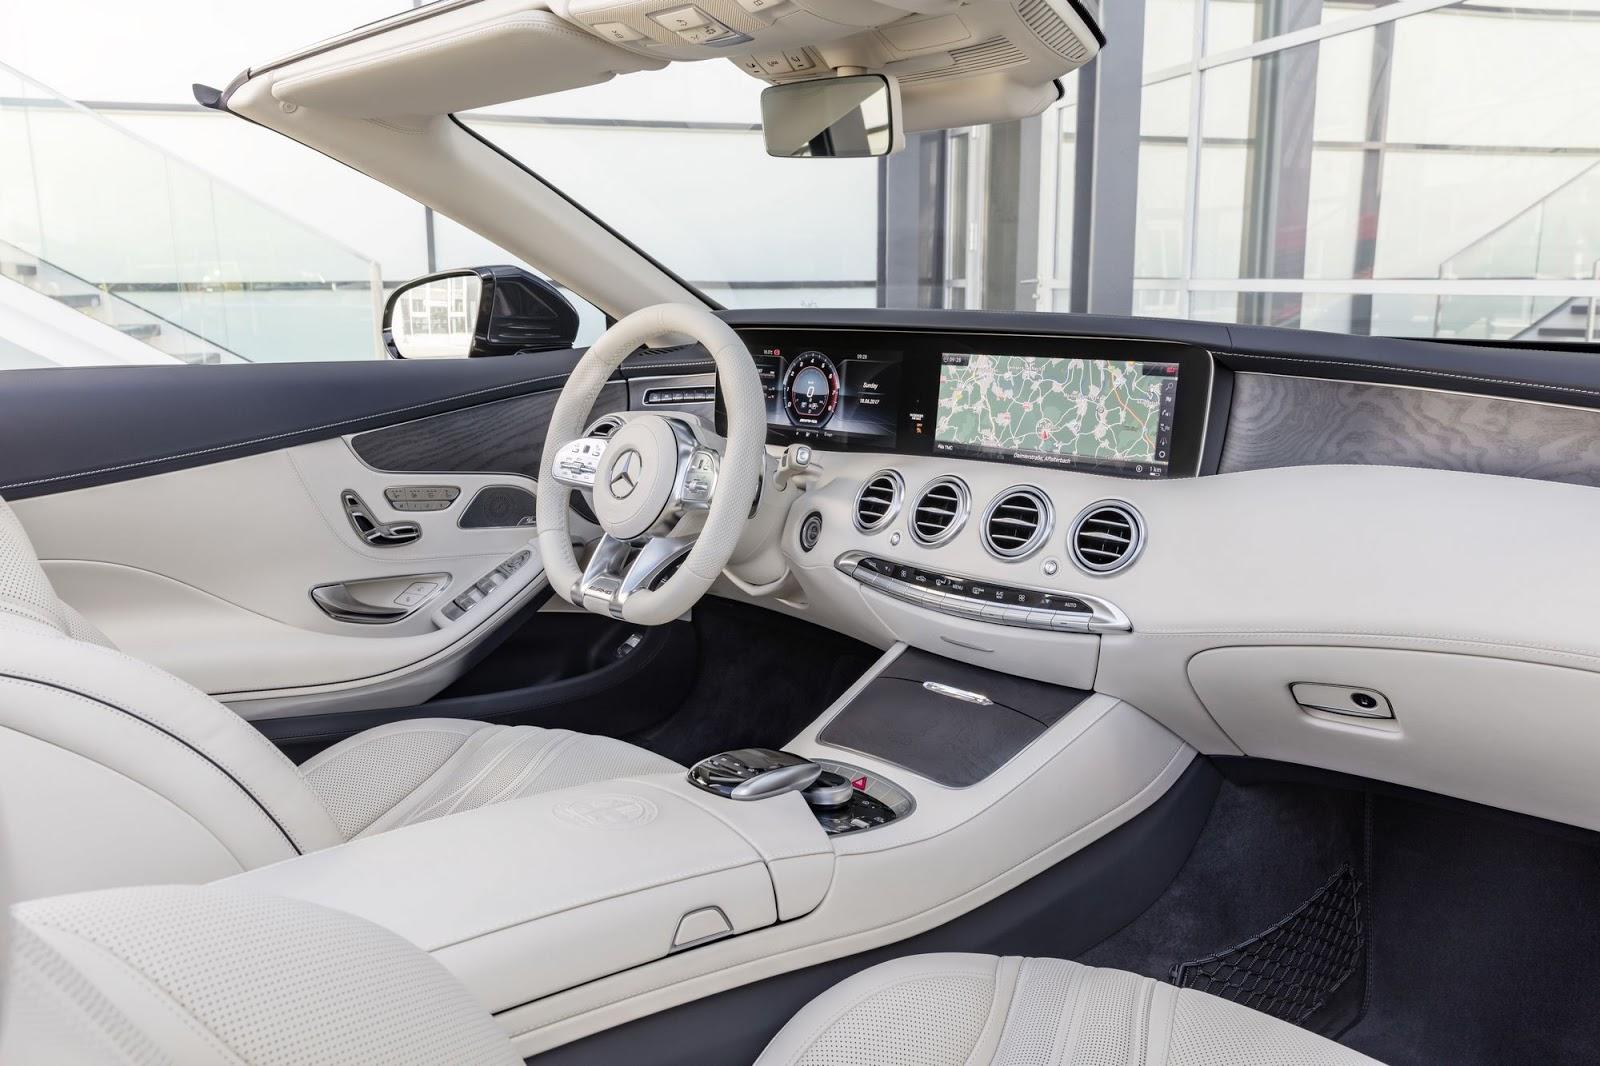 Mercedes-AMG S 65 Cabriolet, 2017. Interieur: designo Leder Exklusiv Nappa AMG porzellan/tiefseeblau. Exterieur: anthrazitblau metallic;Kraftstoffverbrauch kombiniert: 12,0 l/100 km; CO2-Emissionen kombiniert: 272 g/km*Mercedes-AMG S 65 Cabriolet, 2017. nterior: designo leather exclusive nappa AMG porcelain/ deep-sea blue.  Exterior: anthracite blue metallic;Fuel consumption combined: 12.0 l/100 km; CO2 emissions combined: 272 g/km*